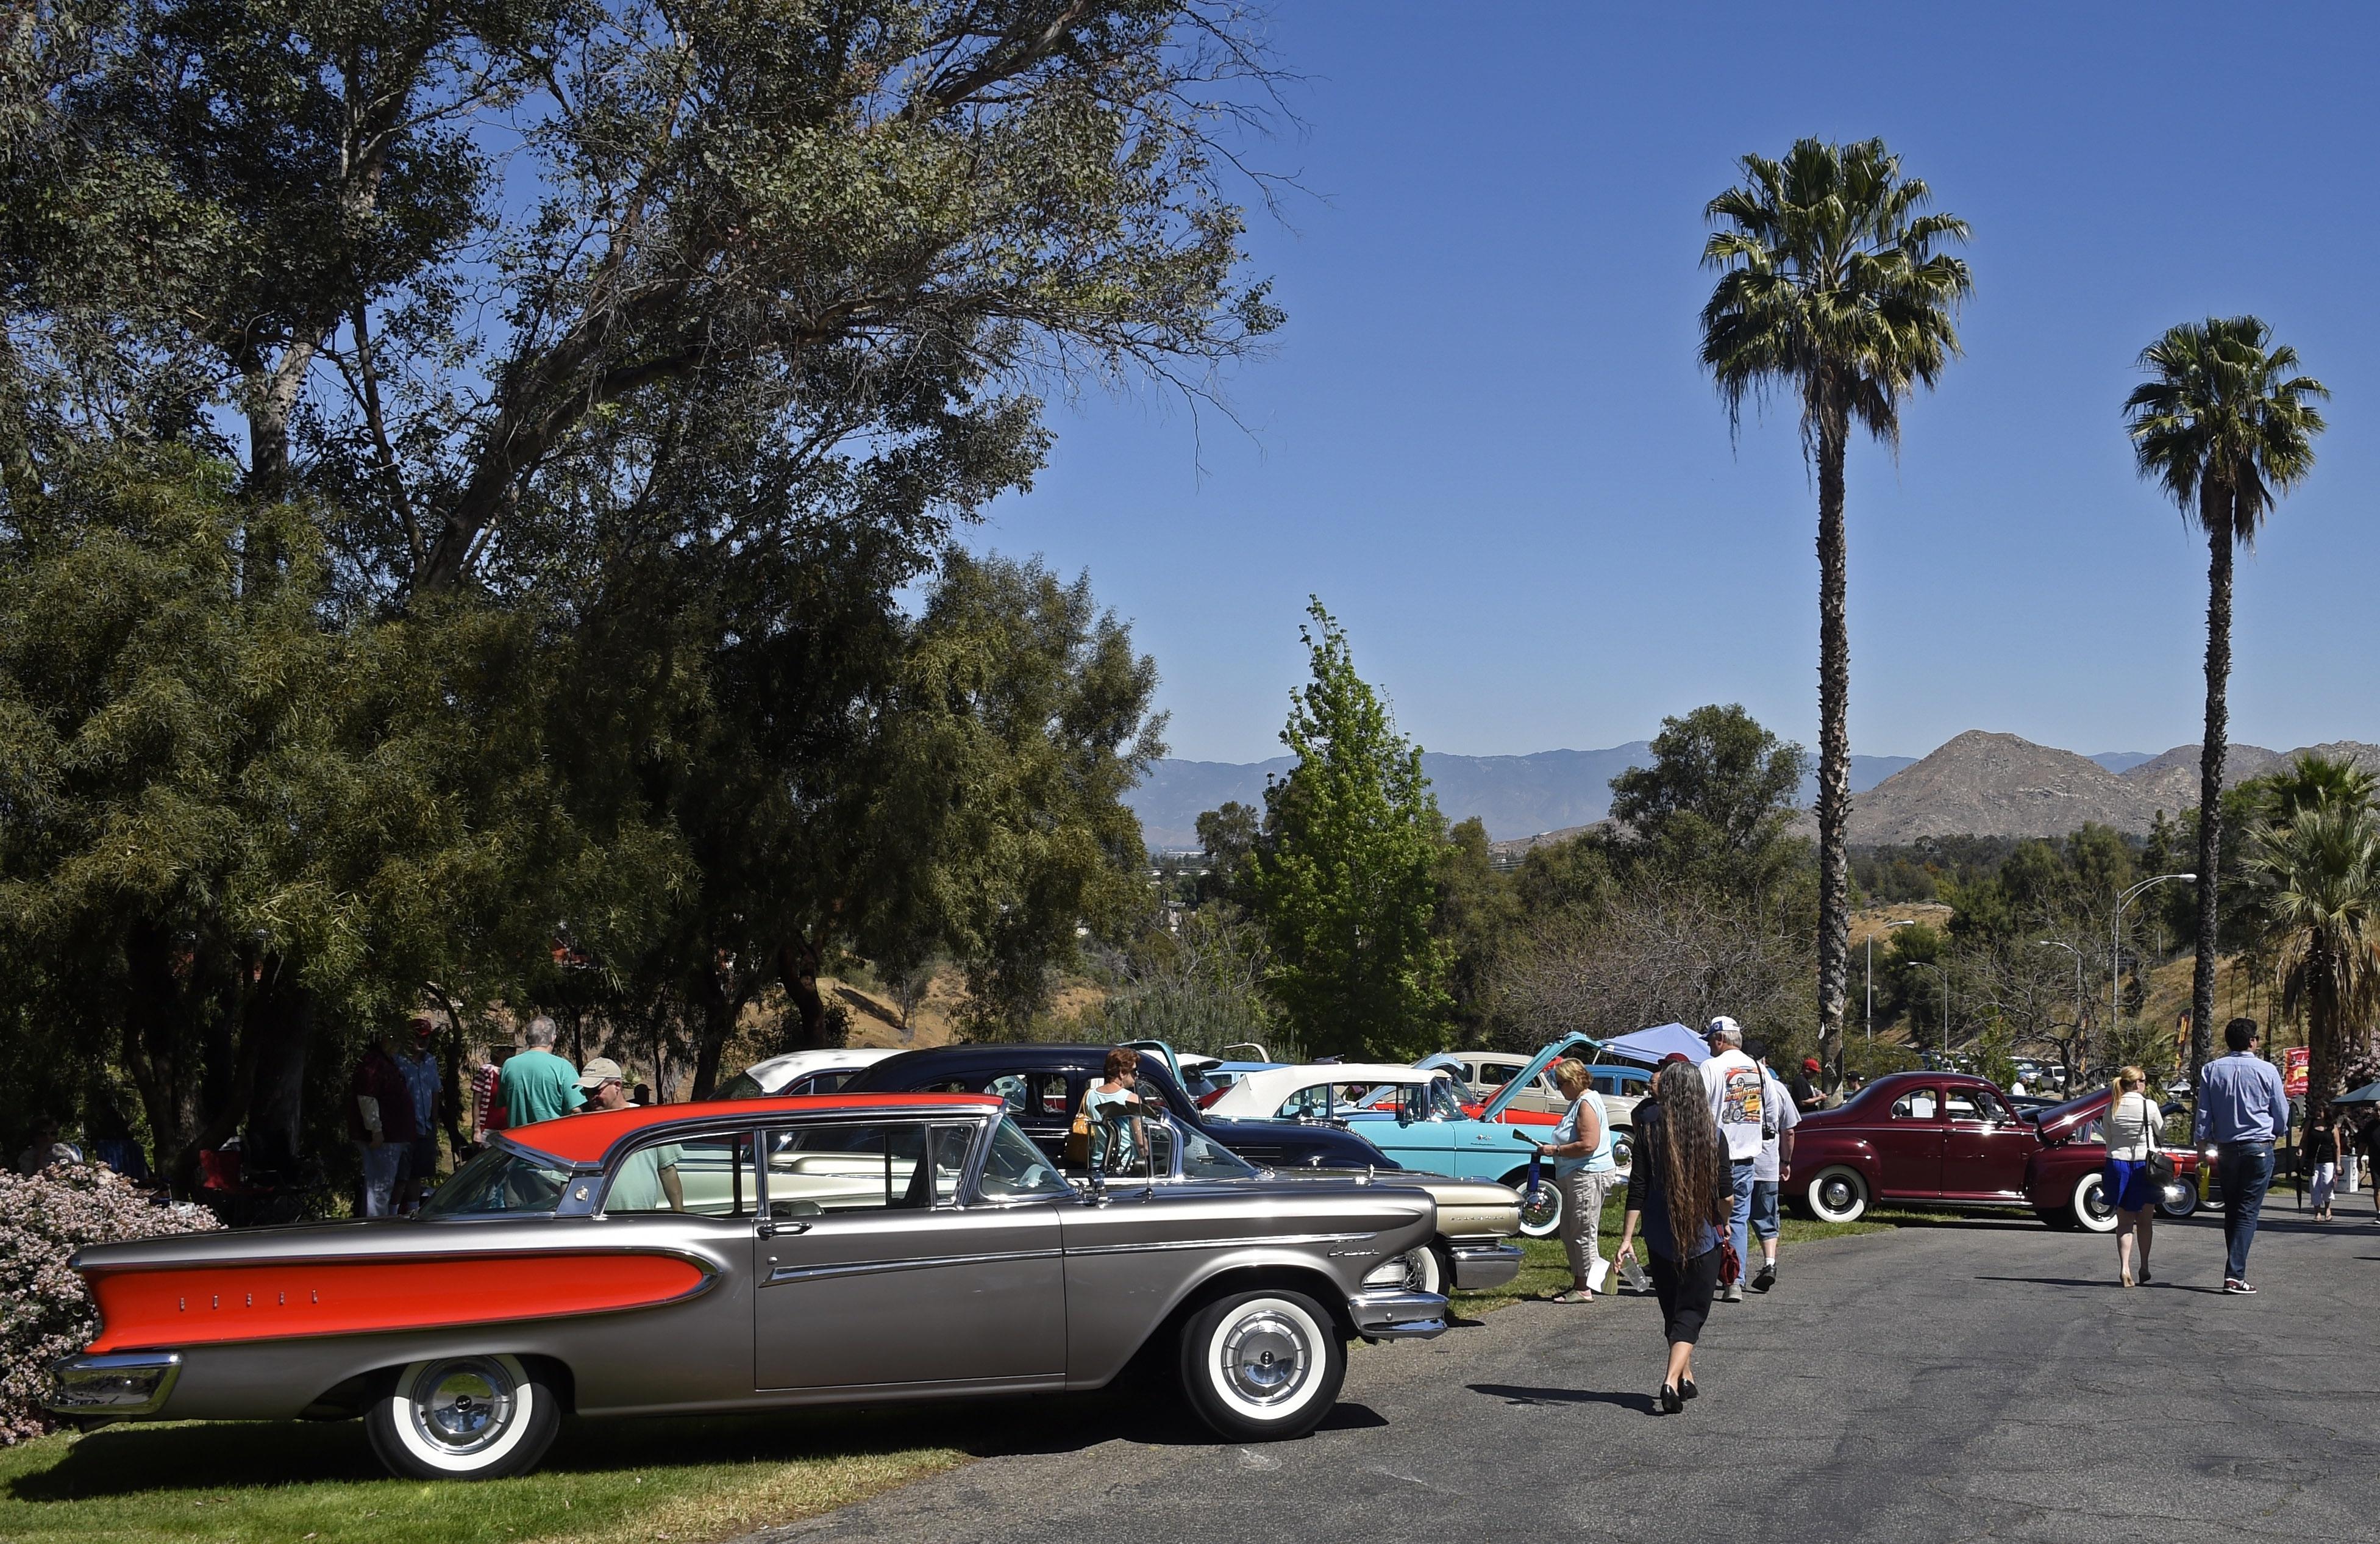 Riverside Ca Car Show Today